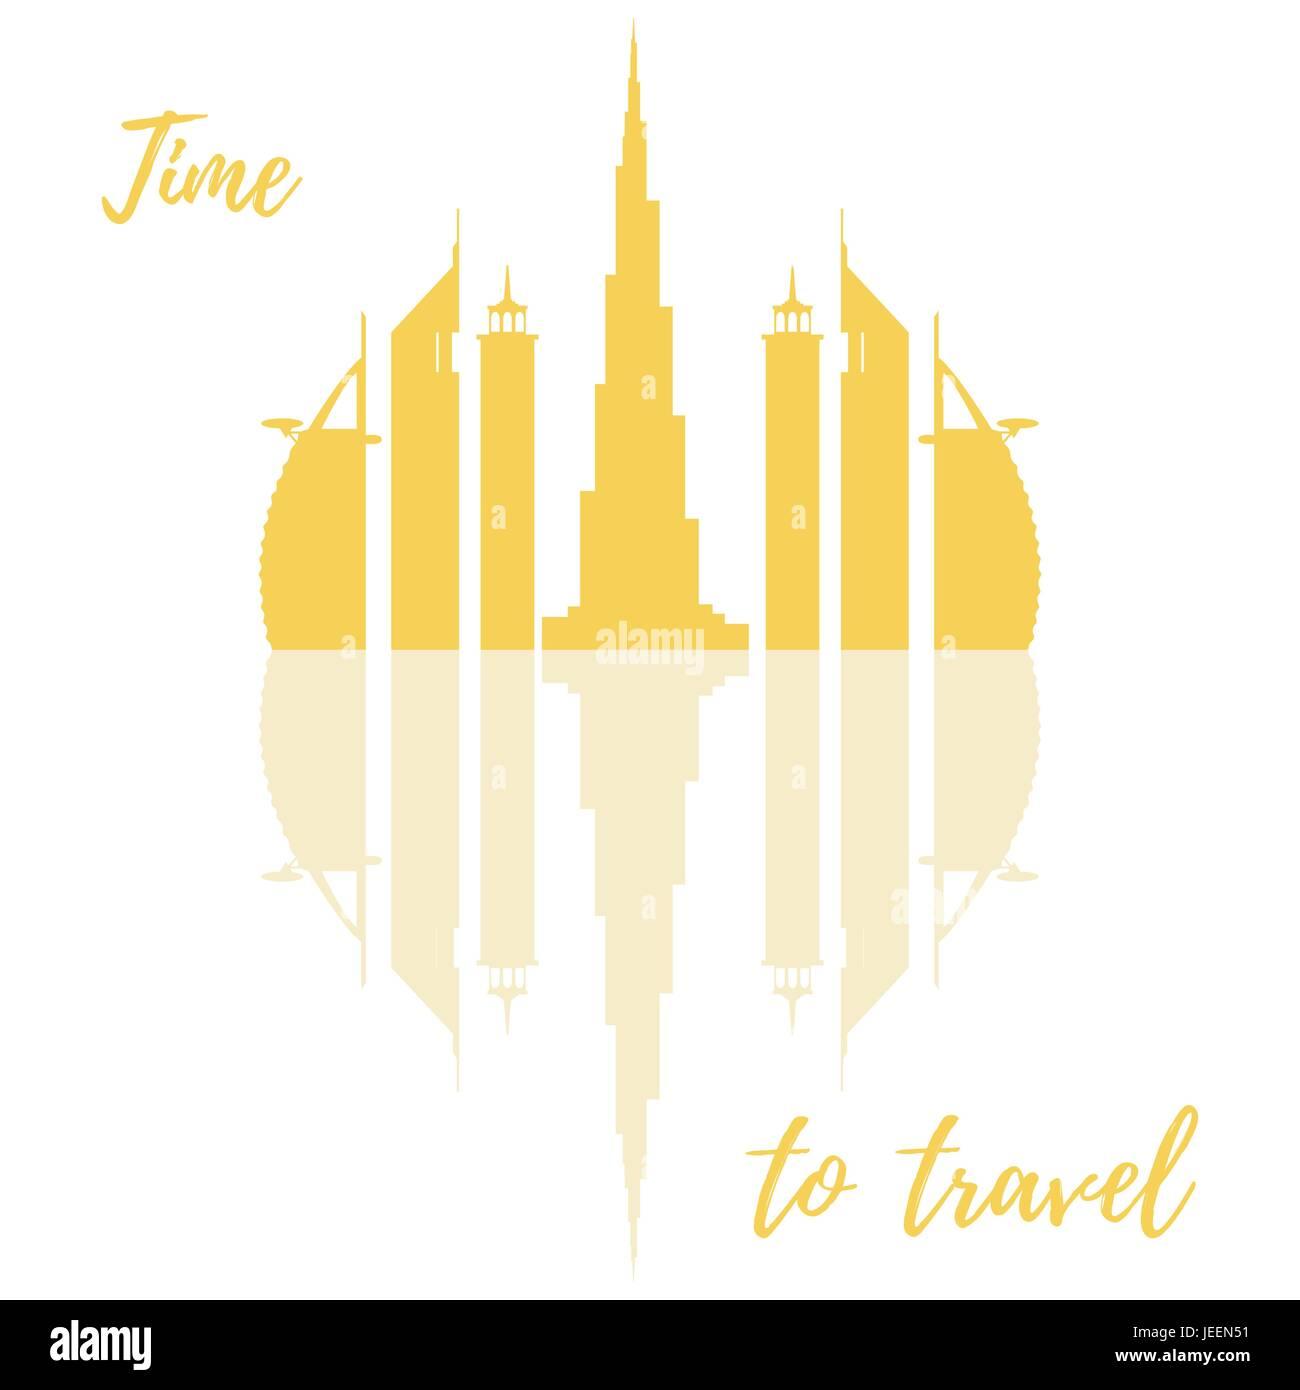 Vector illustration of United Arab Emirates skyscrapers silhouette. Dubai buildings. Design for banner, poster or - Stock Image